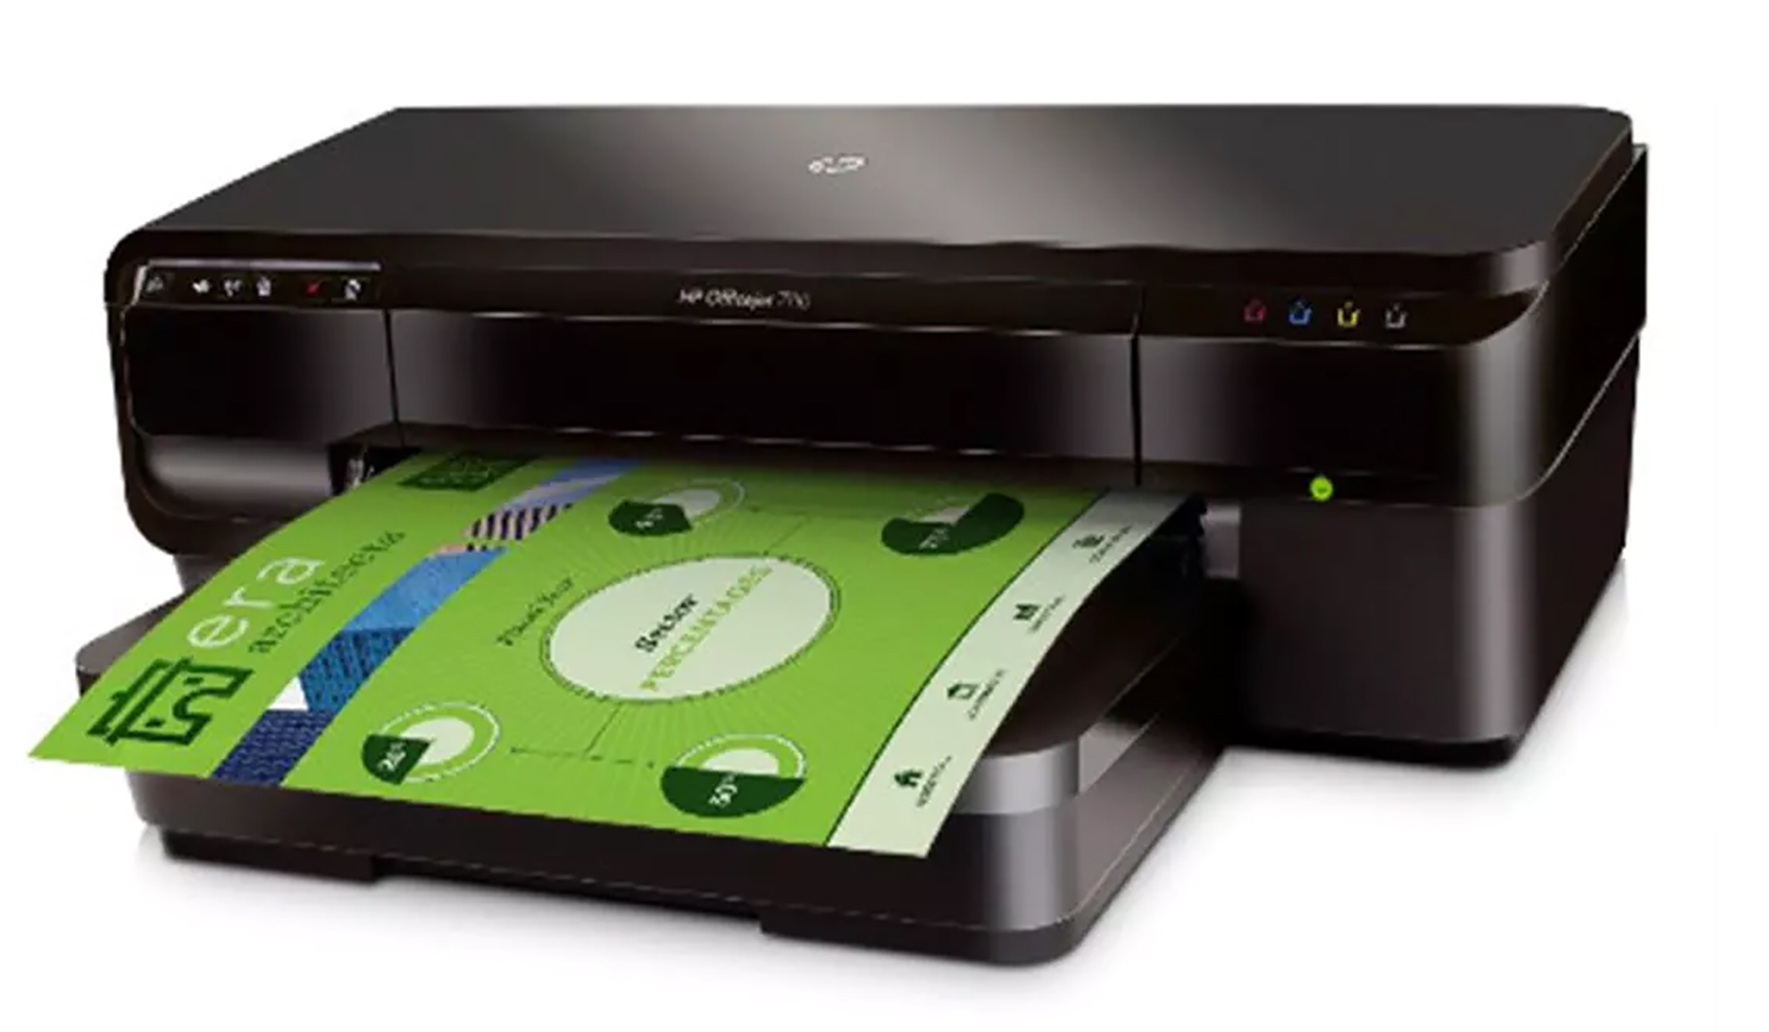 Harga Jual HP CR768A OfficeJet 7110 Wide Format ePrinter